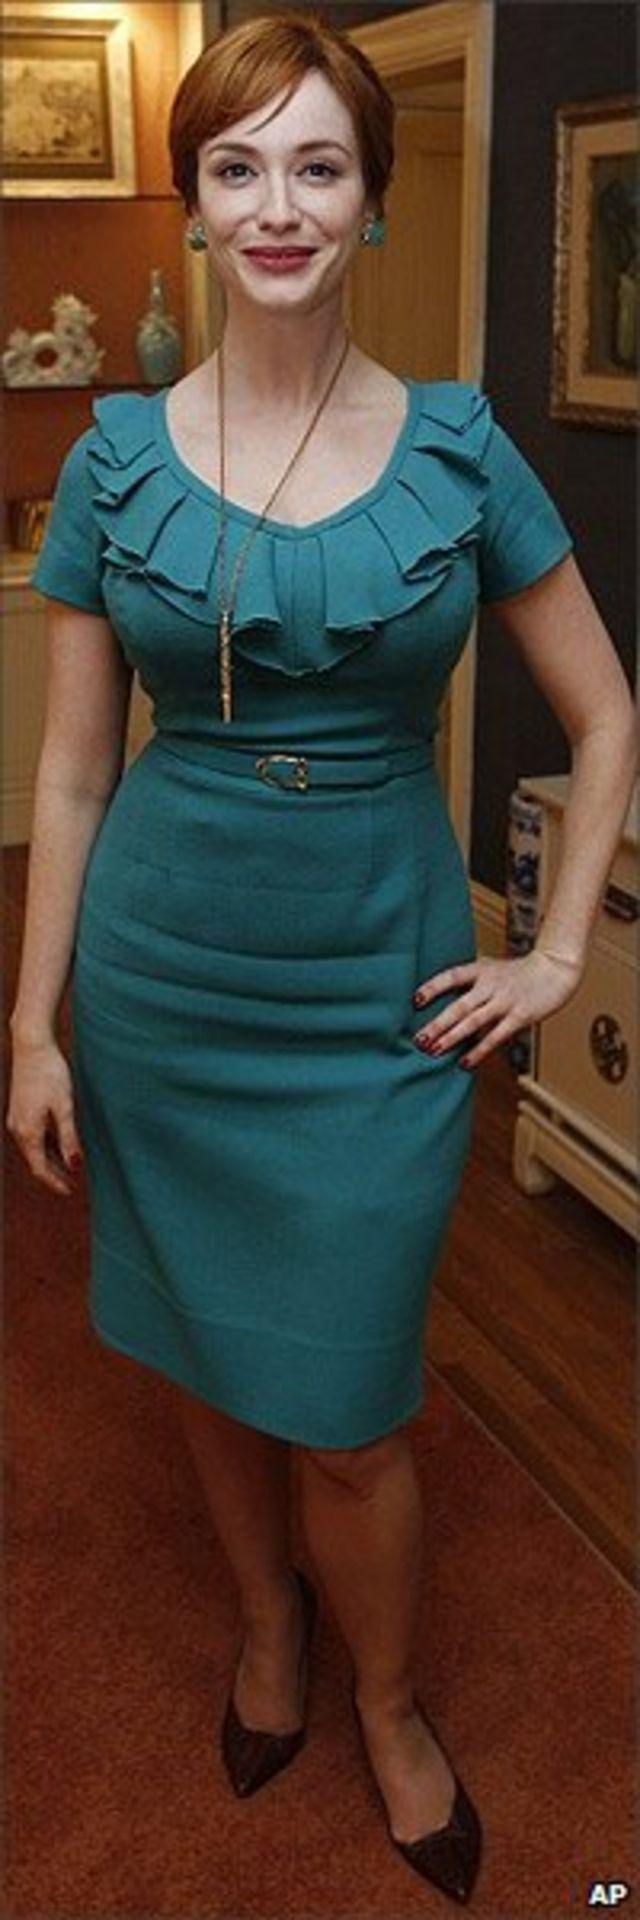 Christina Hendricks Breast Size